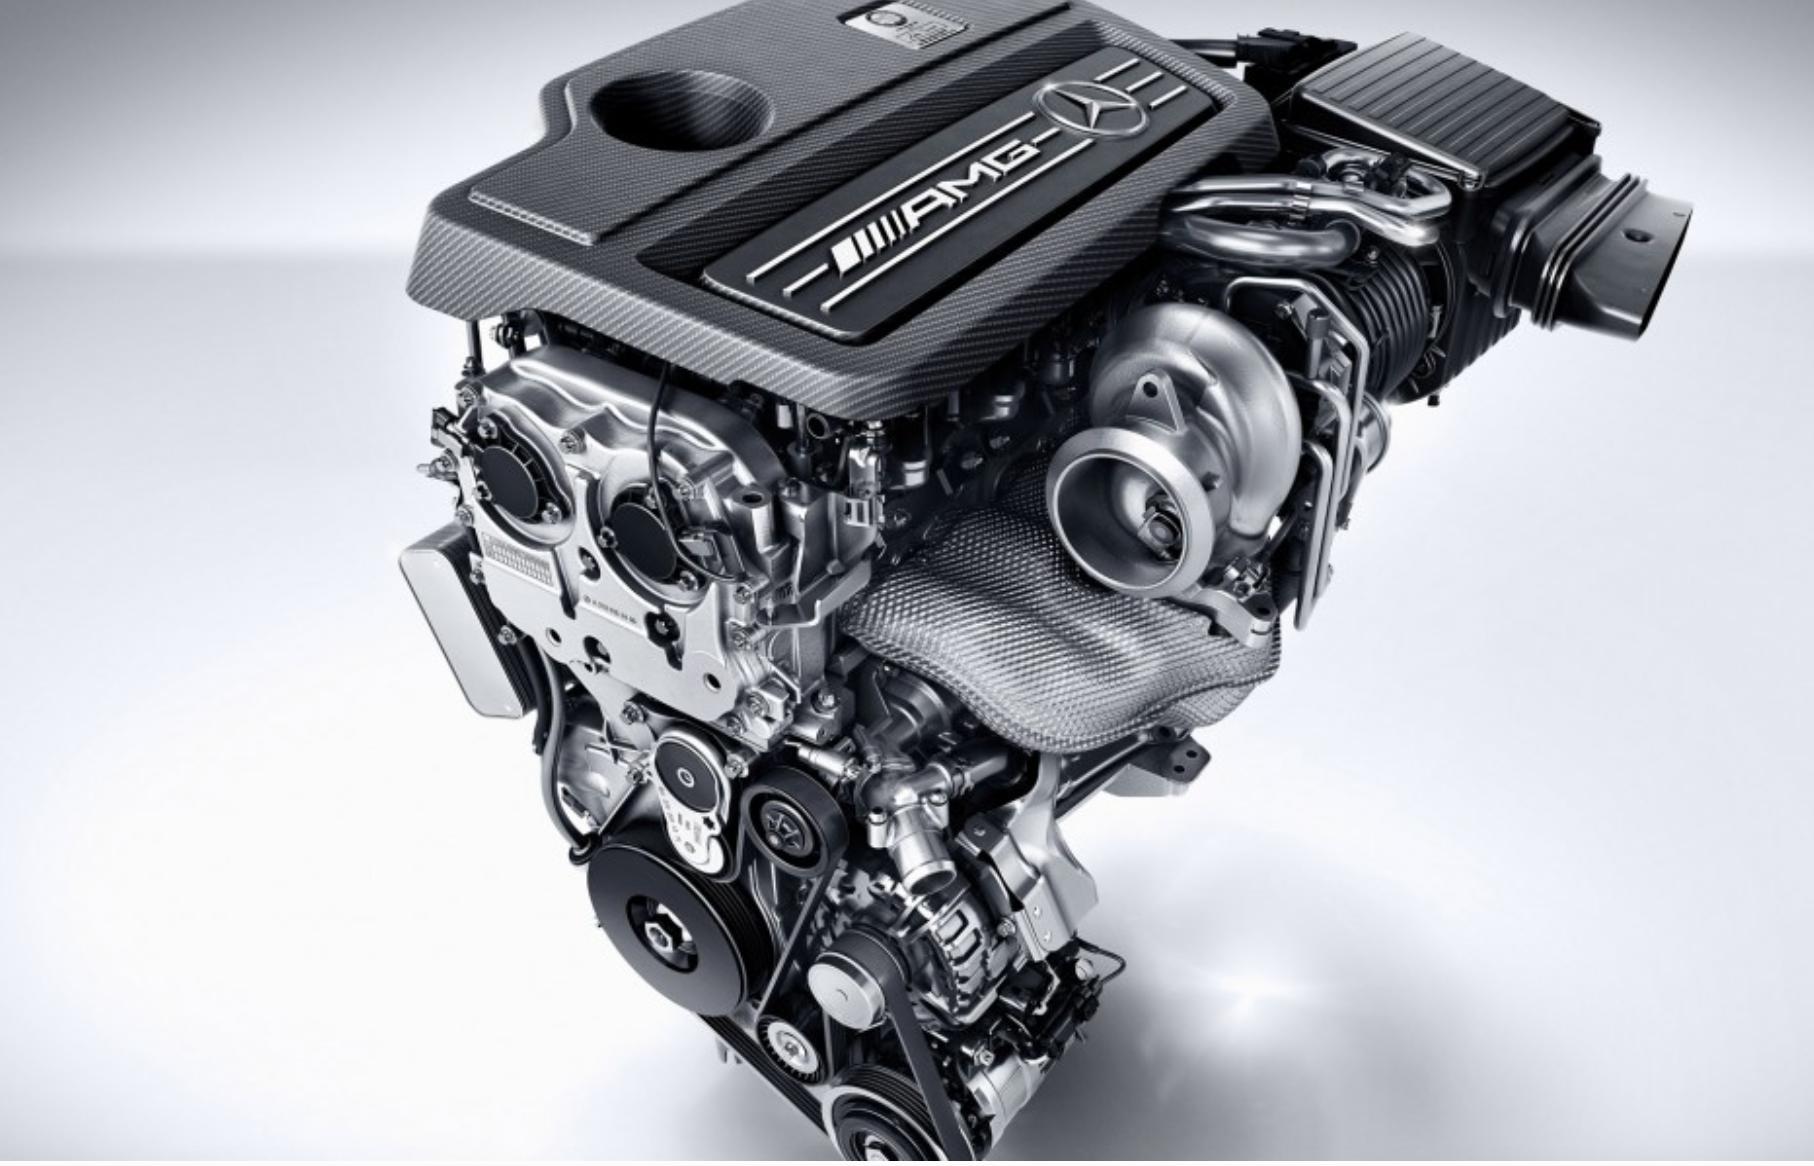 Bmw m12/m13 turbo 15 liter four cylinder formula 1 motor photos/pictures/specs - 1500+ horsepower